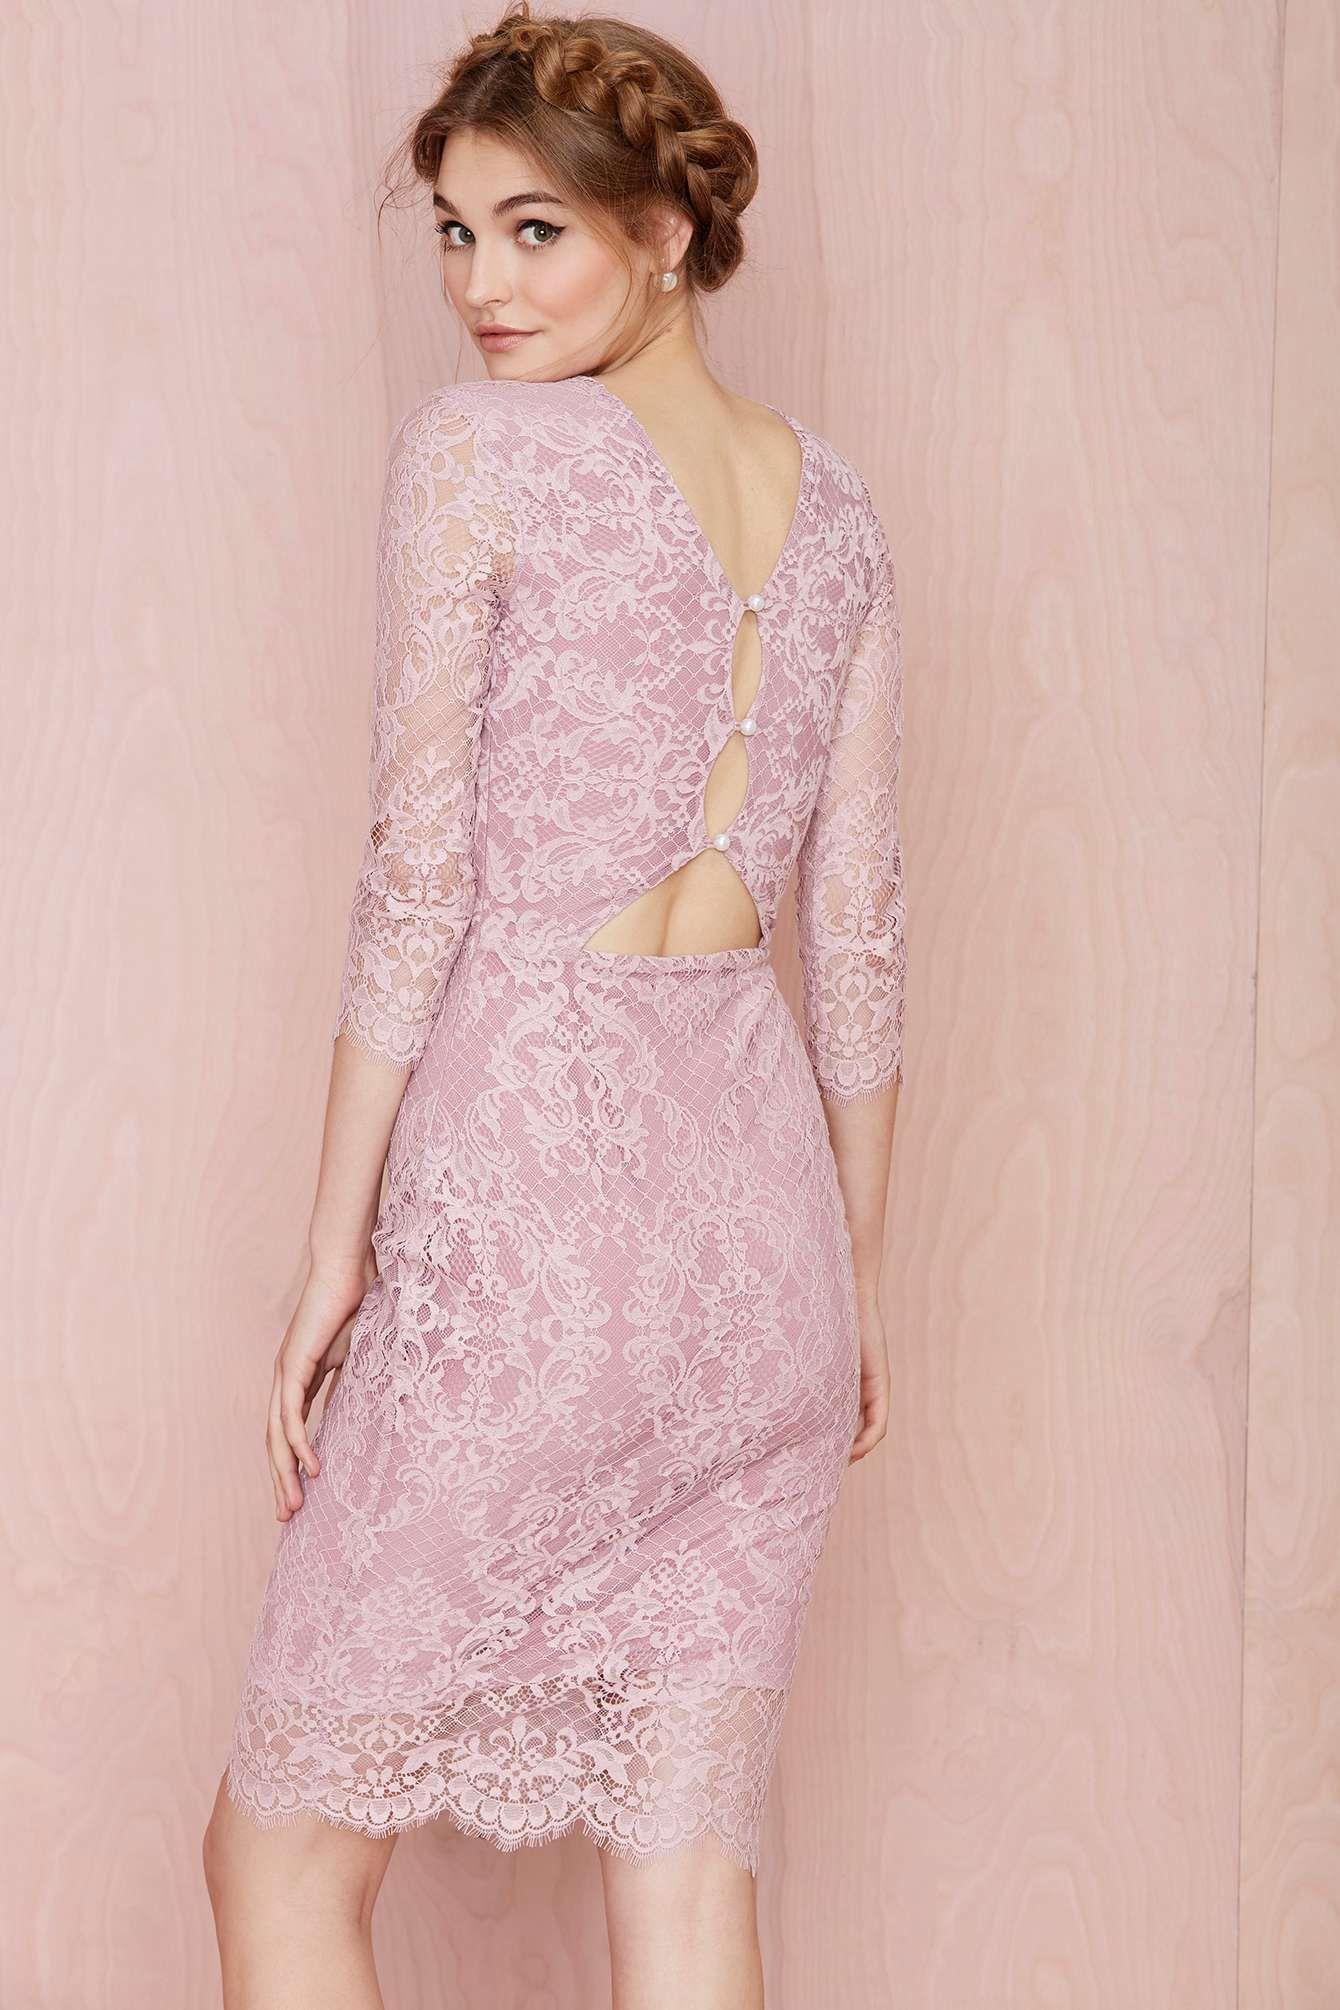 For Love and Lemons Pot Pourri Lace Dress | Shop Dresses at Nasty ...